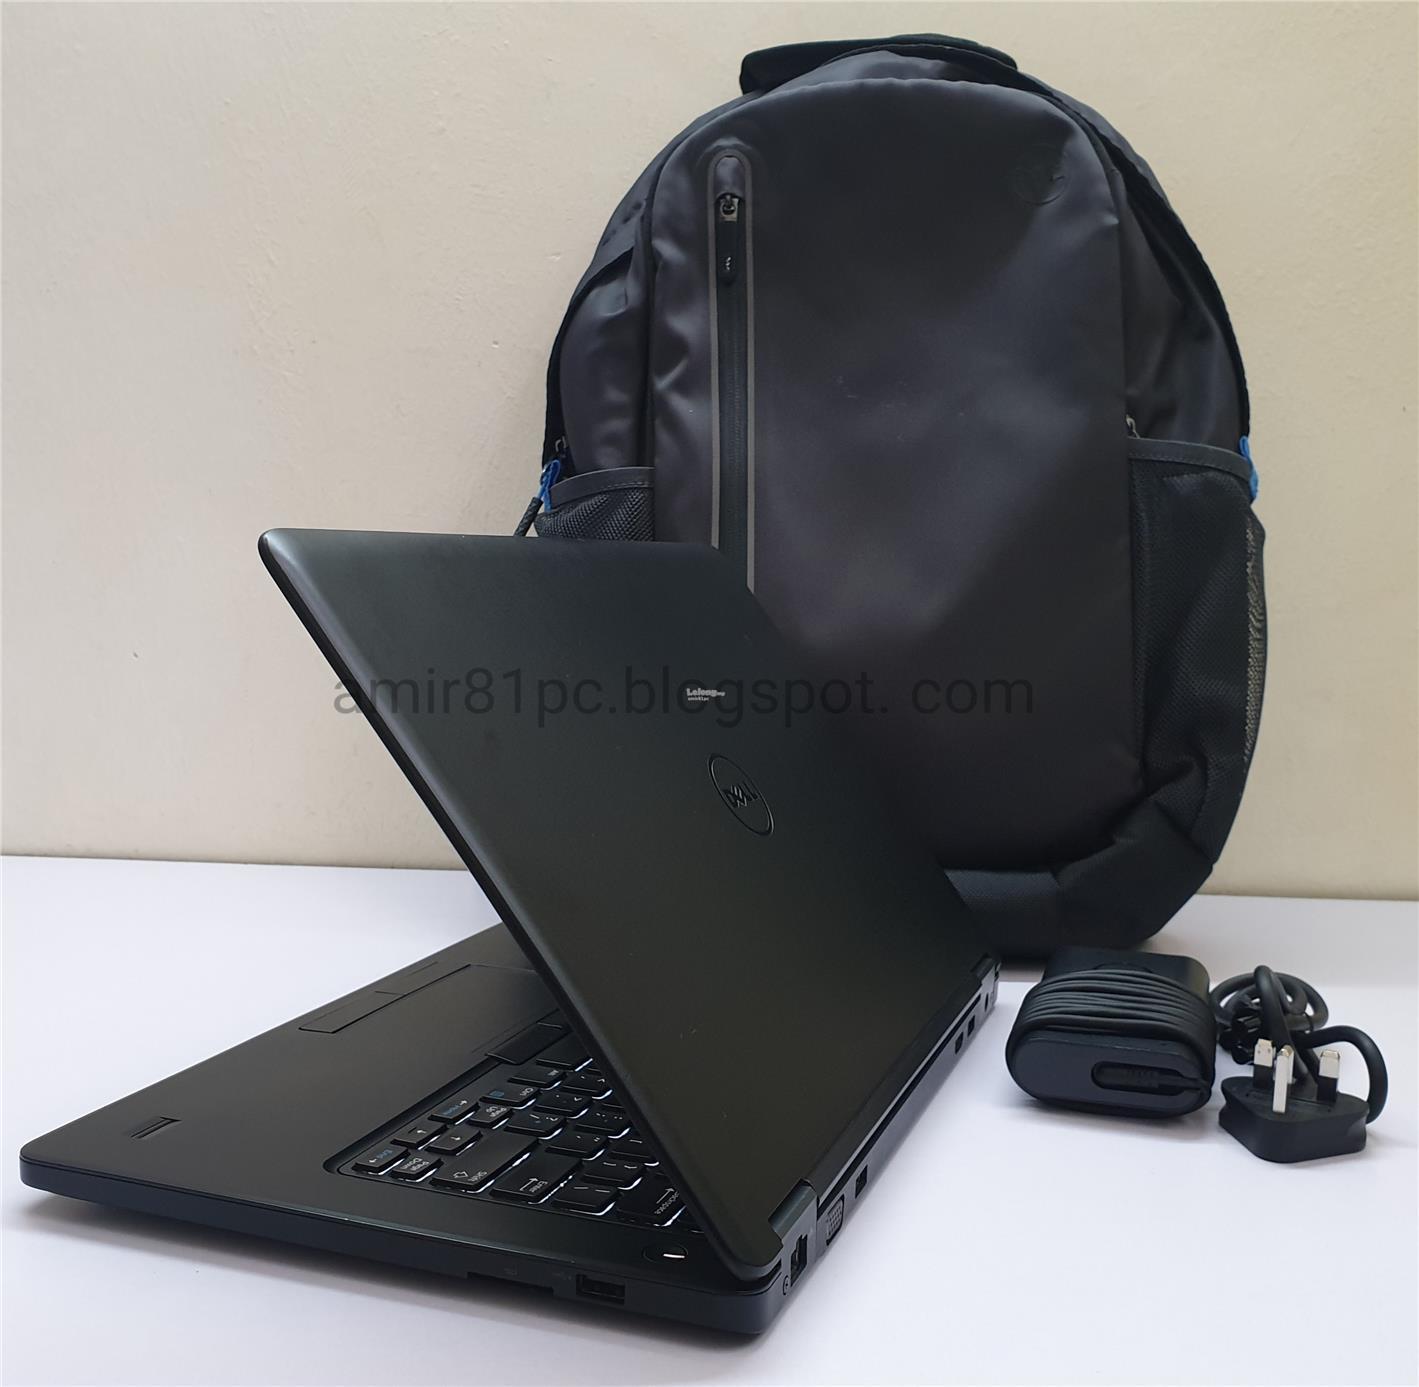 Dell Latitude E5450 / 5th Gen Core i5 / 8GB RAM / Backlit Keyboard